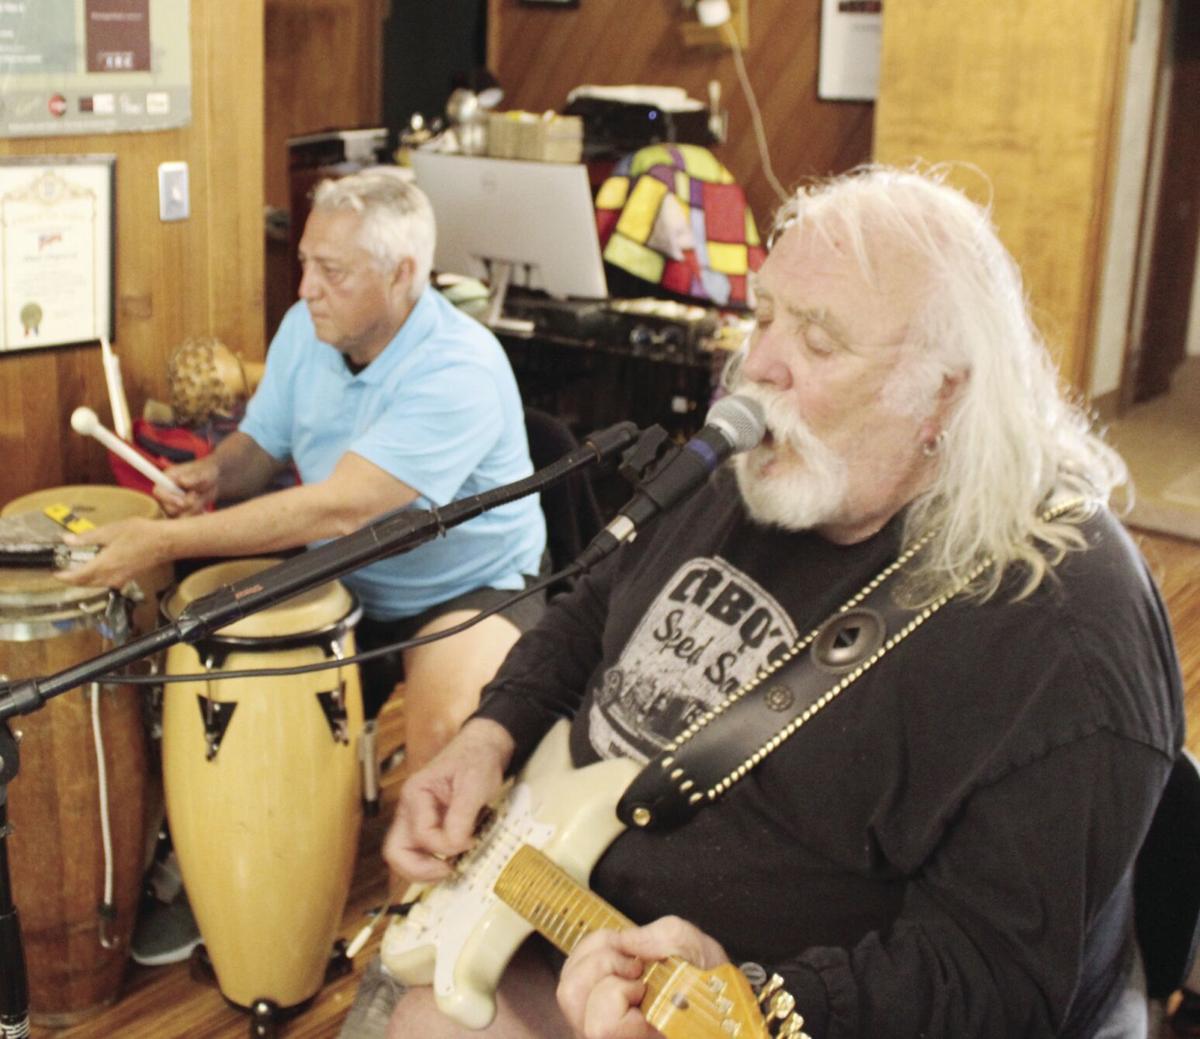 Coos Rhythm and Blues